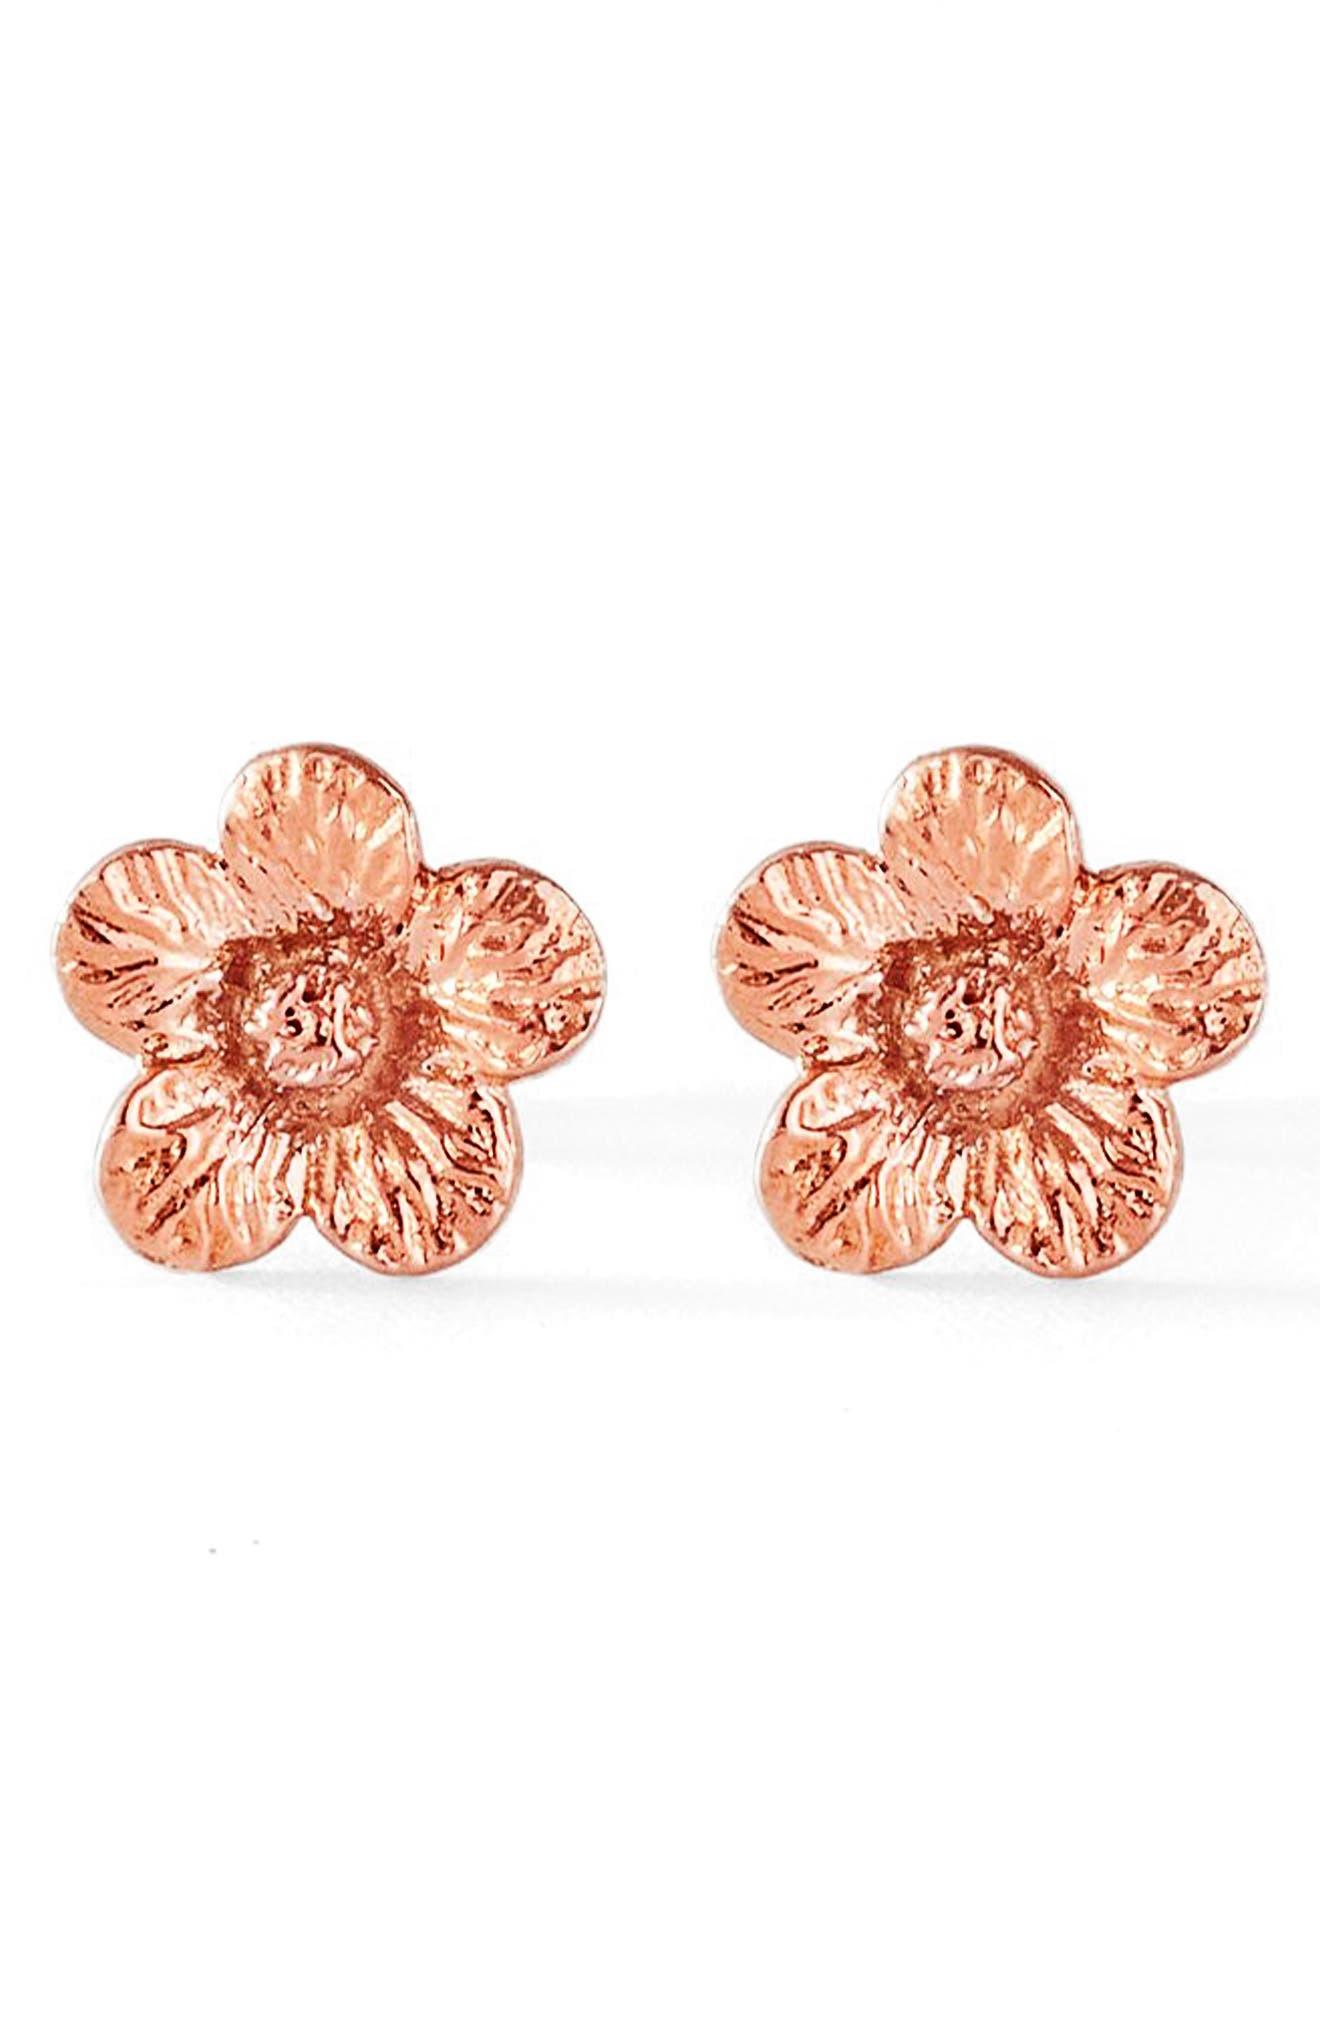 Flora Petunia 14K Gold Earrings